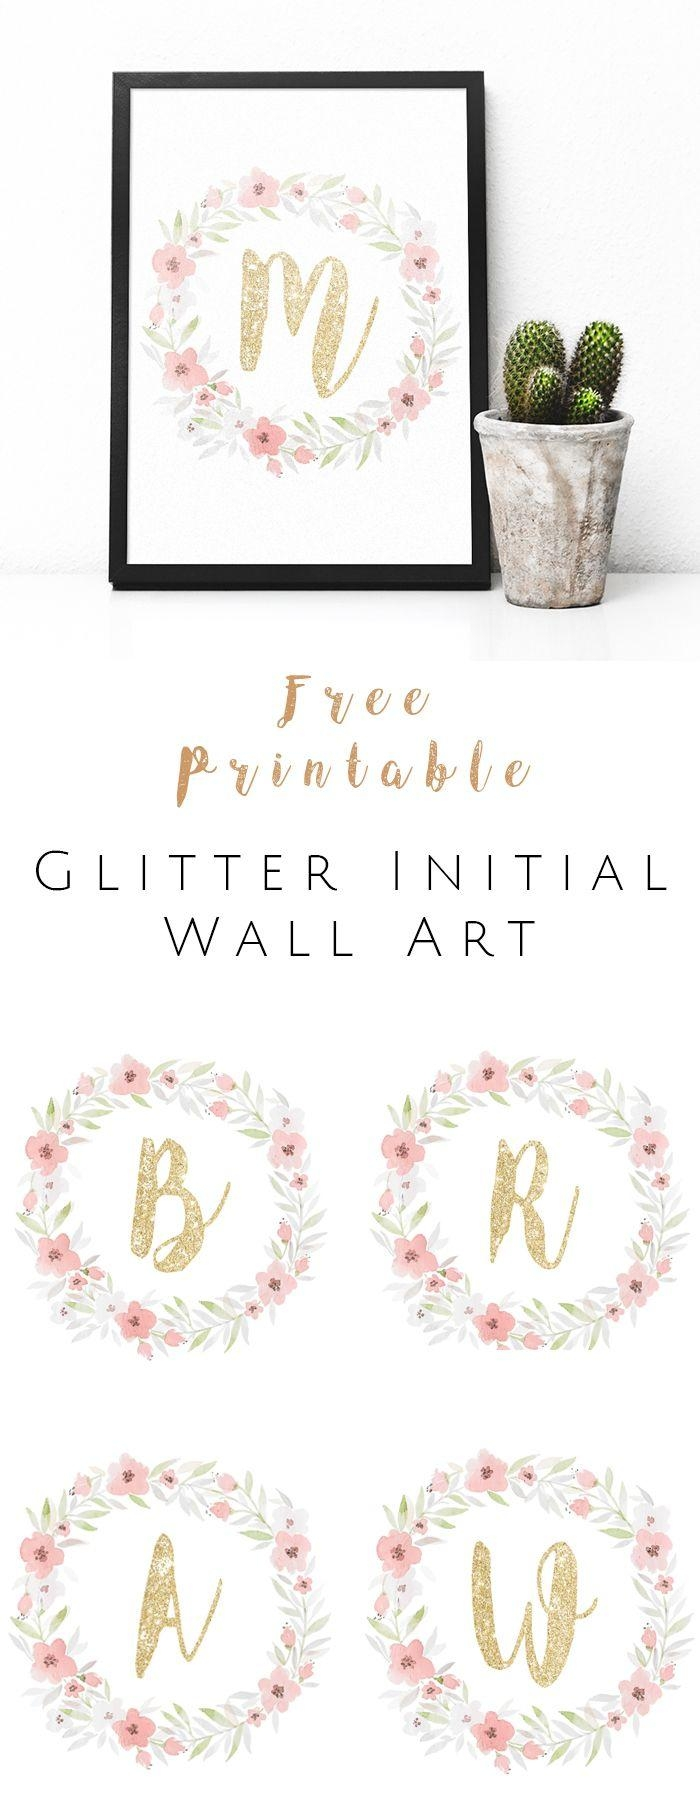 Best 25+ Initial Wall Art Ideas On Pinterest | Monogram Wall Art For Framed Monogram Wall Art (Image 5 of 20)